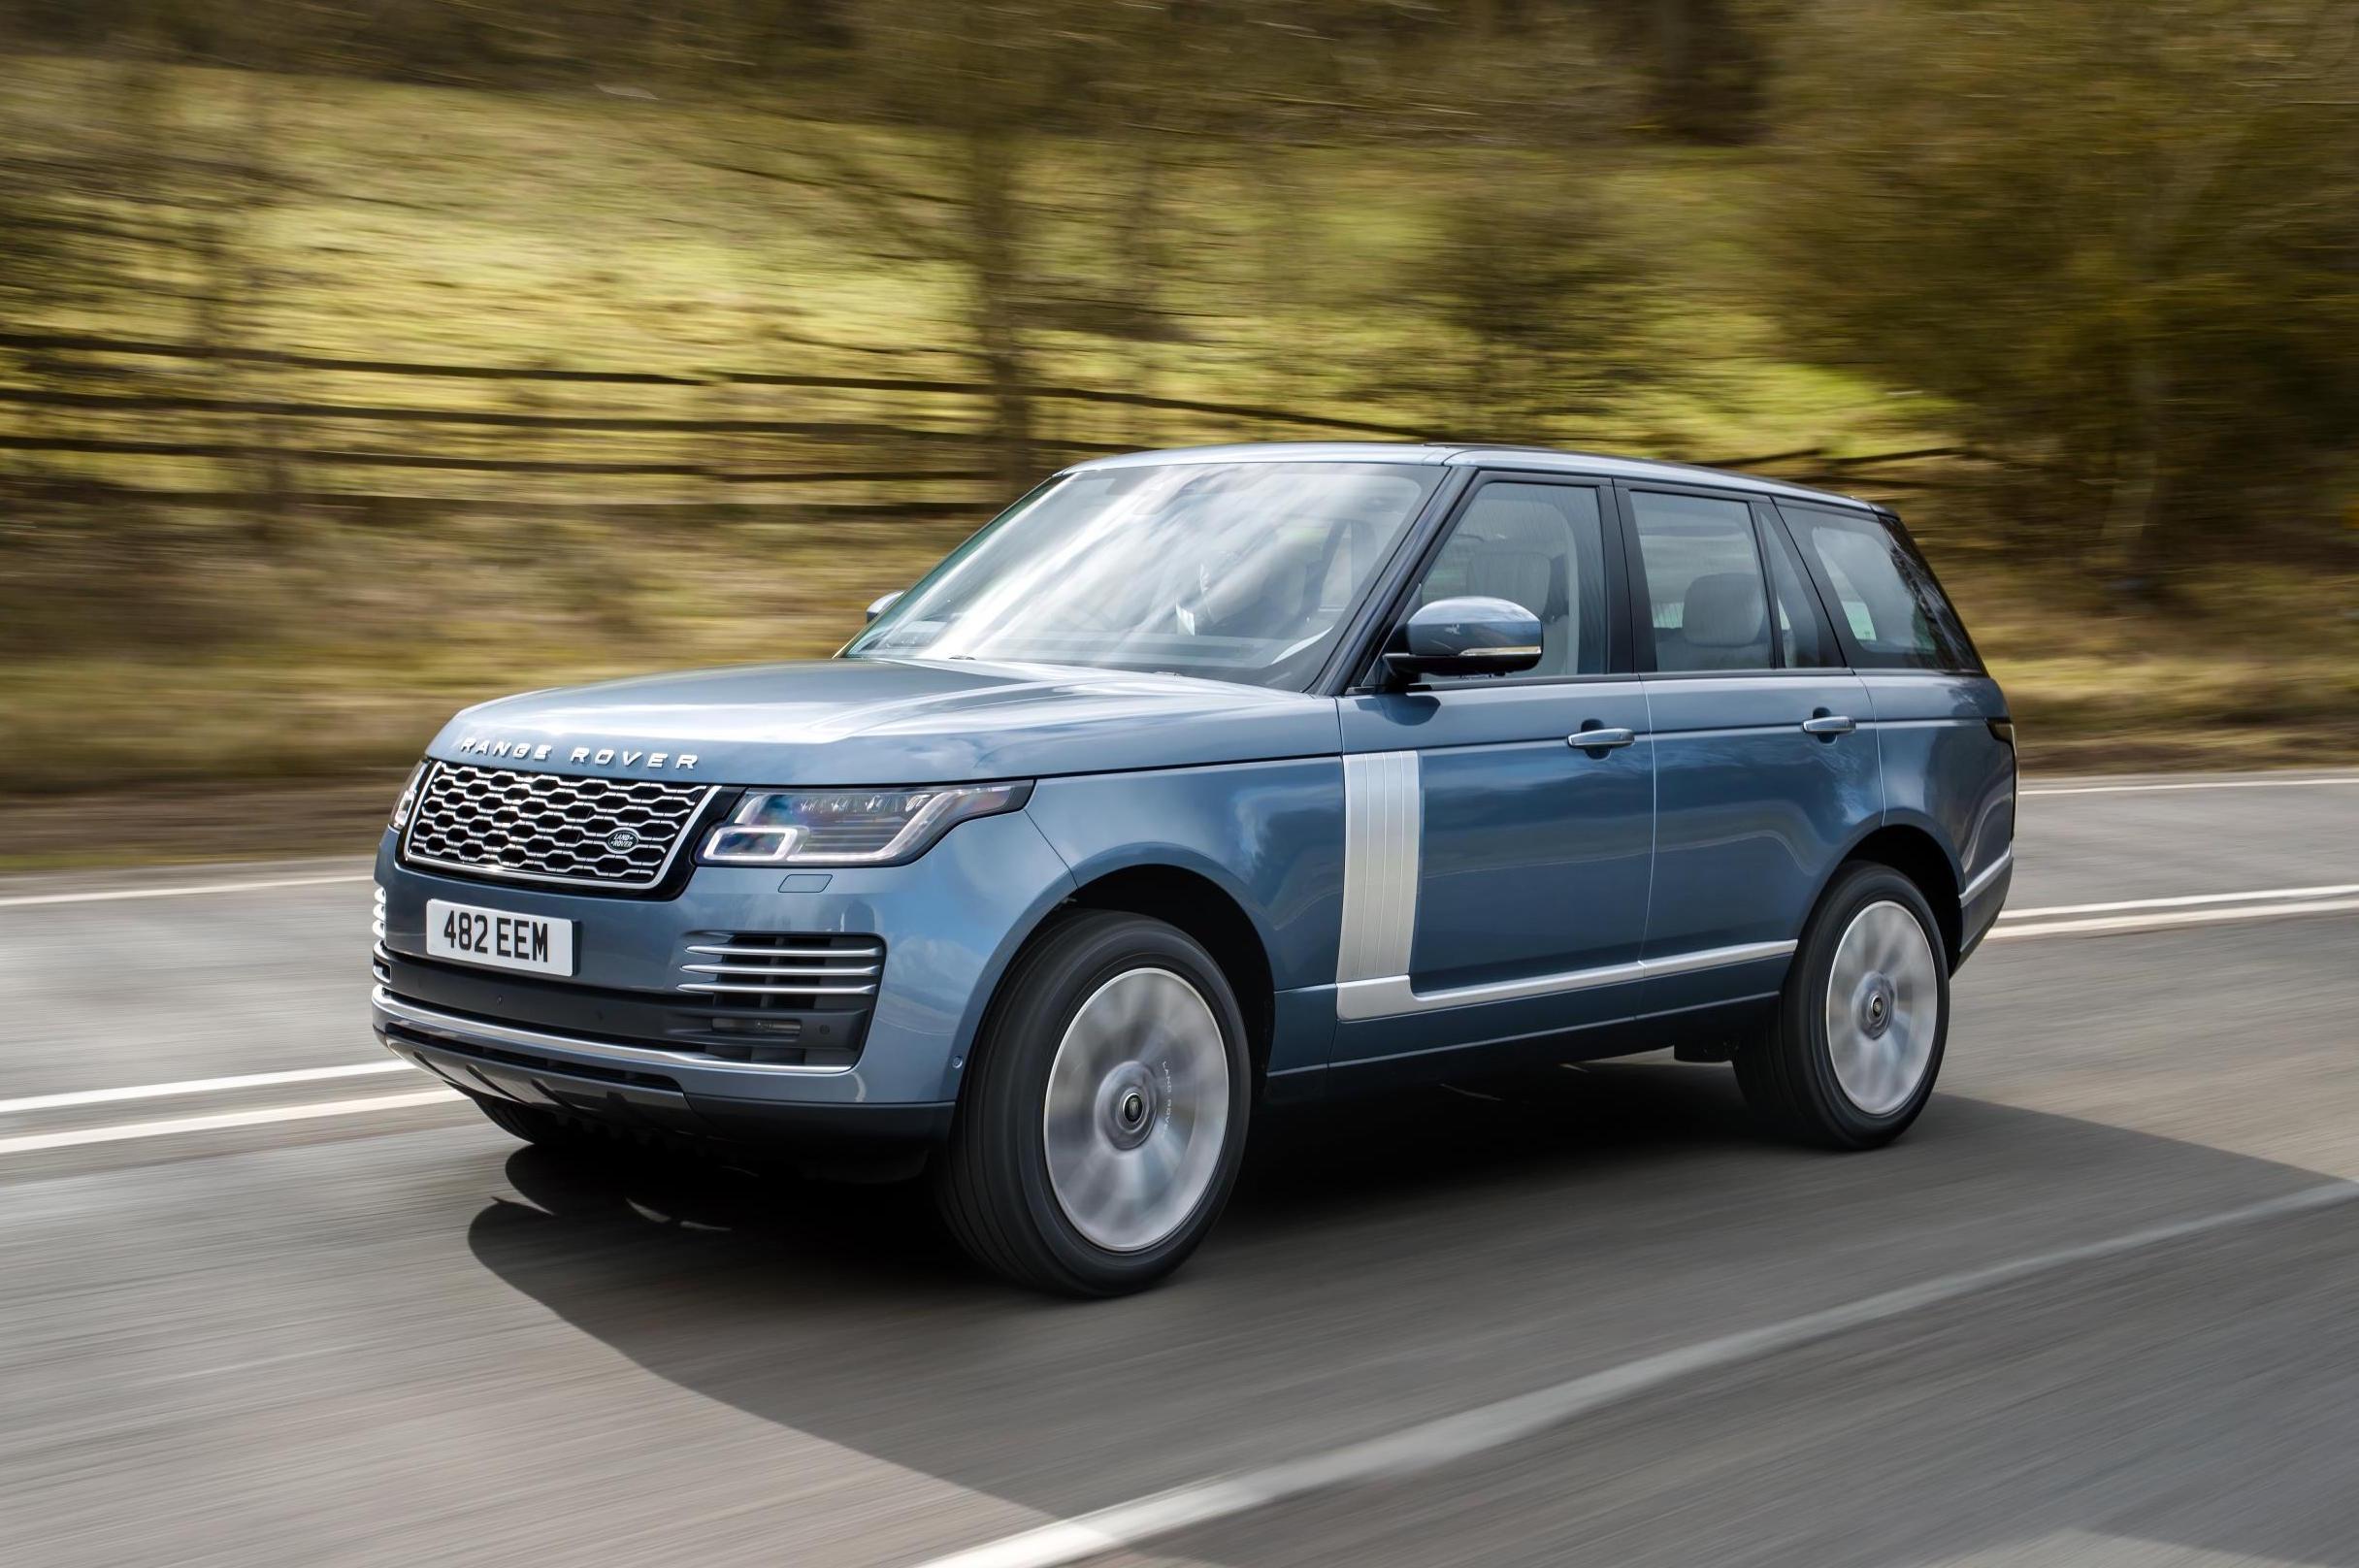 2019 Range Rover now on sale in Australia, new SDV6 added